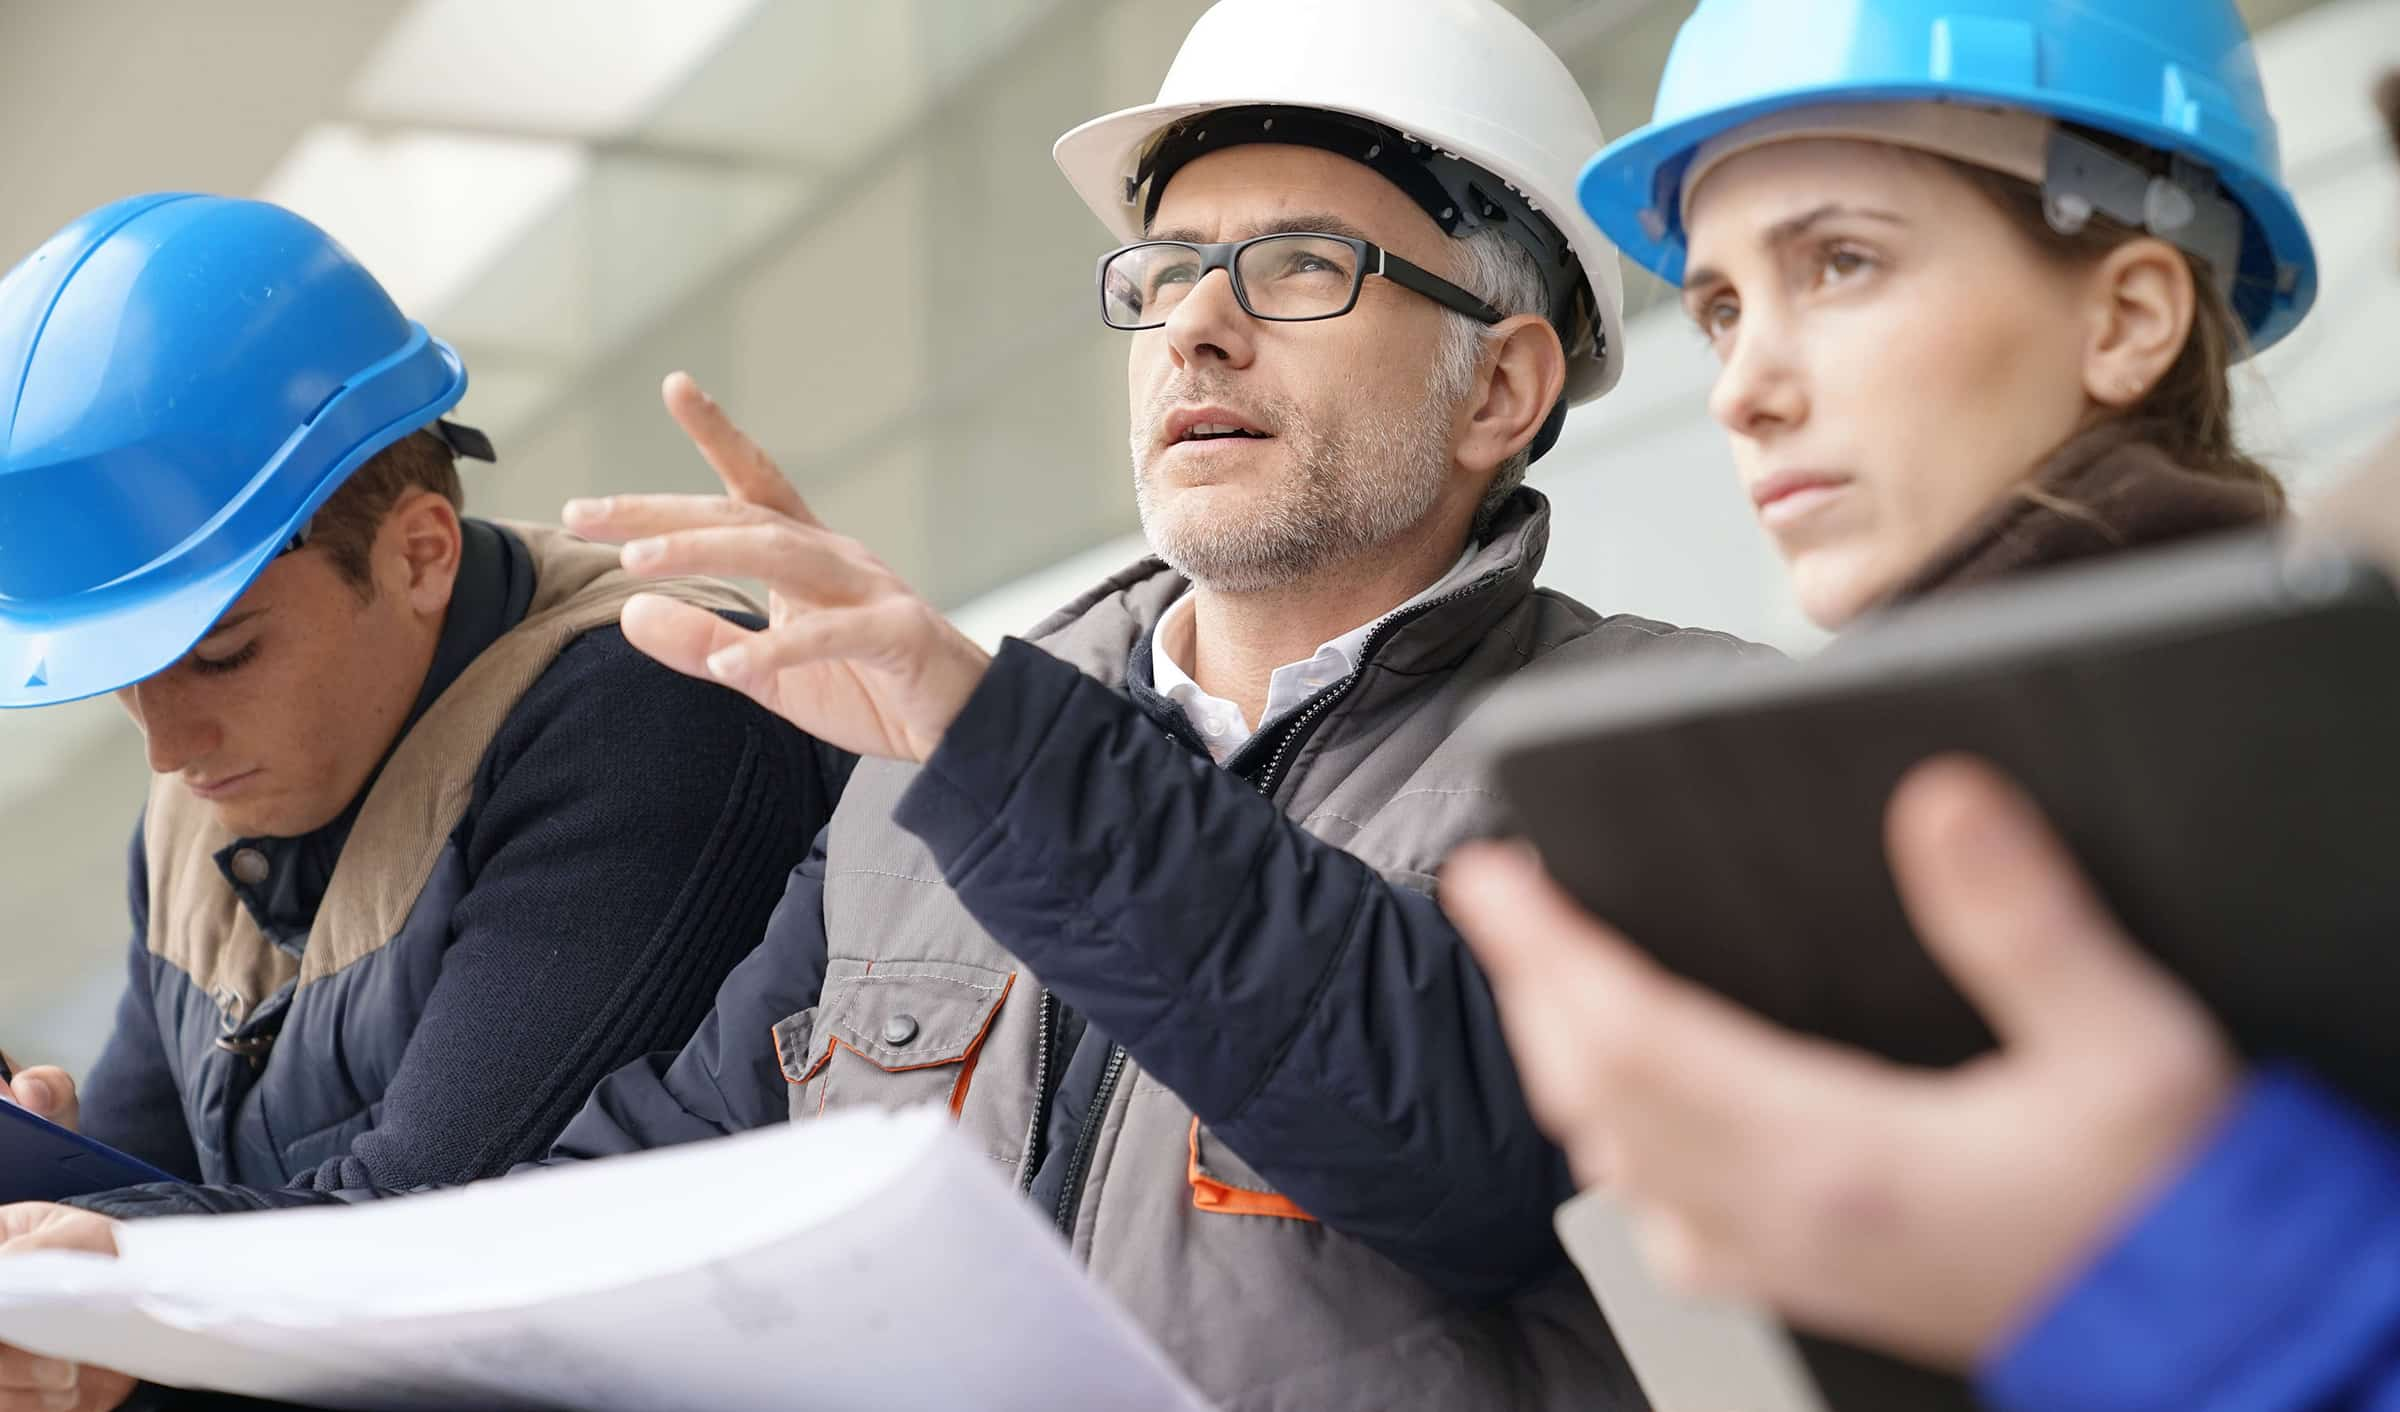 Relevant skills of a Site Supervisor